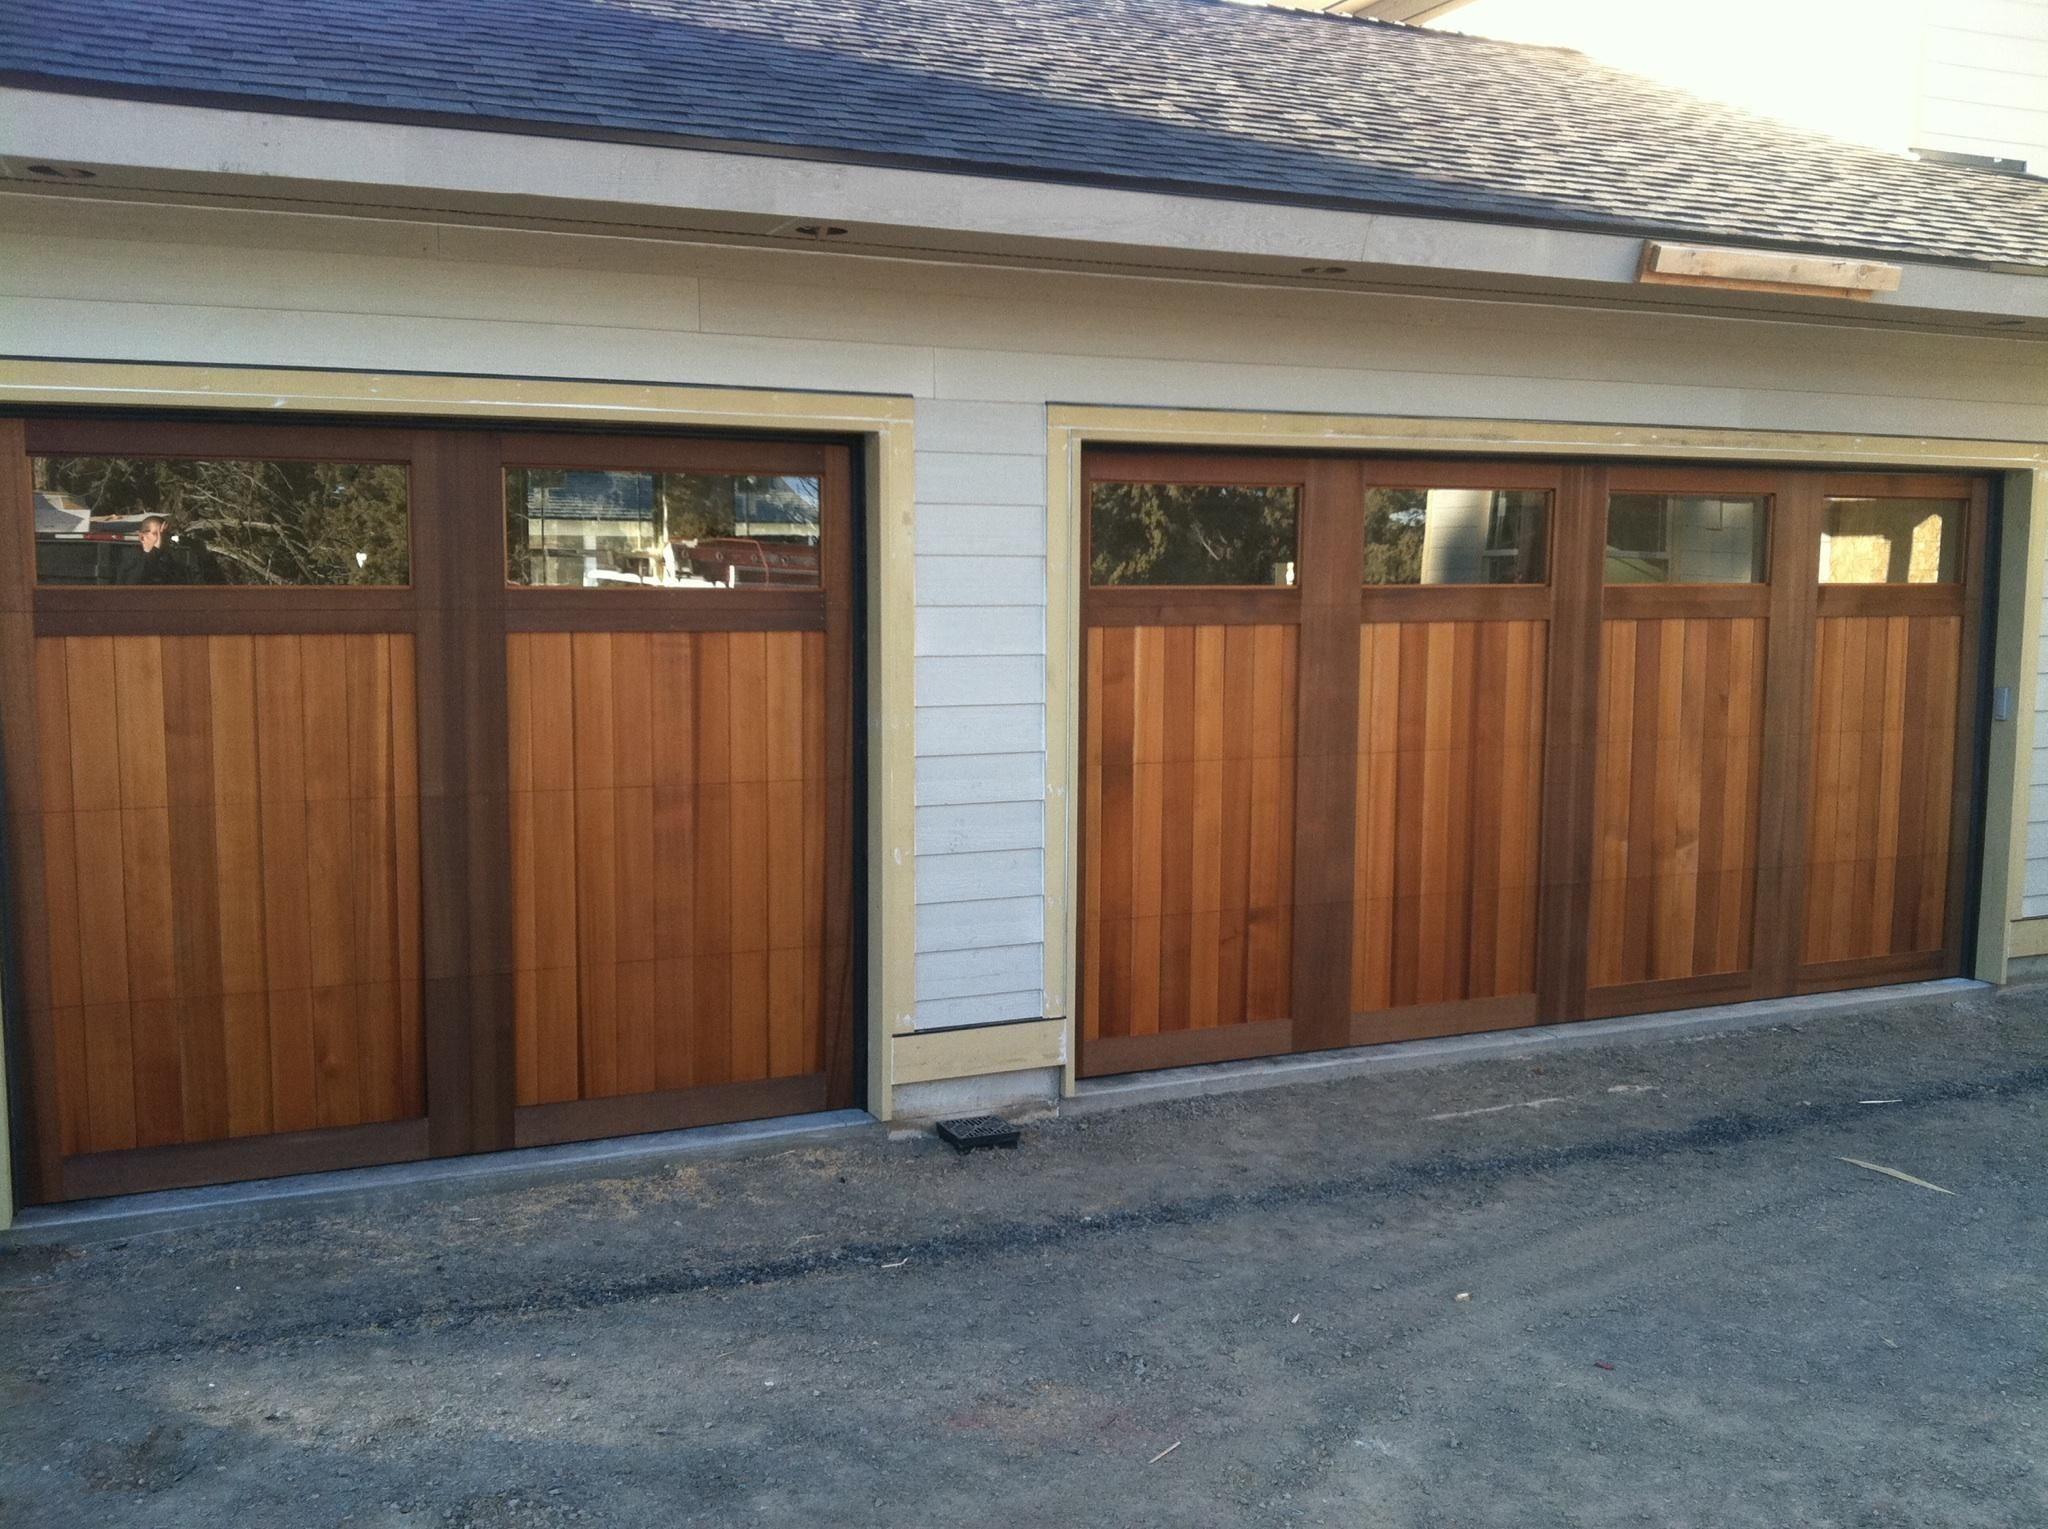 Custom garage doors for sheds httpvoteno123 pinterest custom garage doors for sheds rubansaba